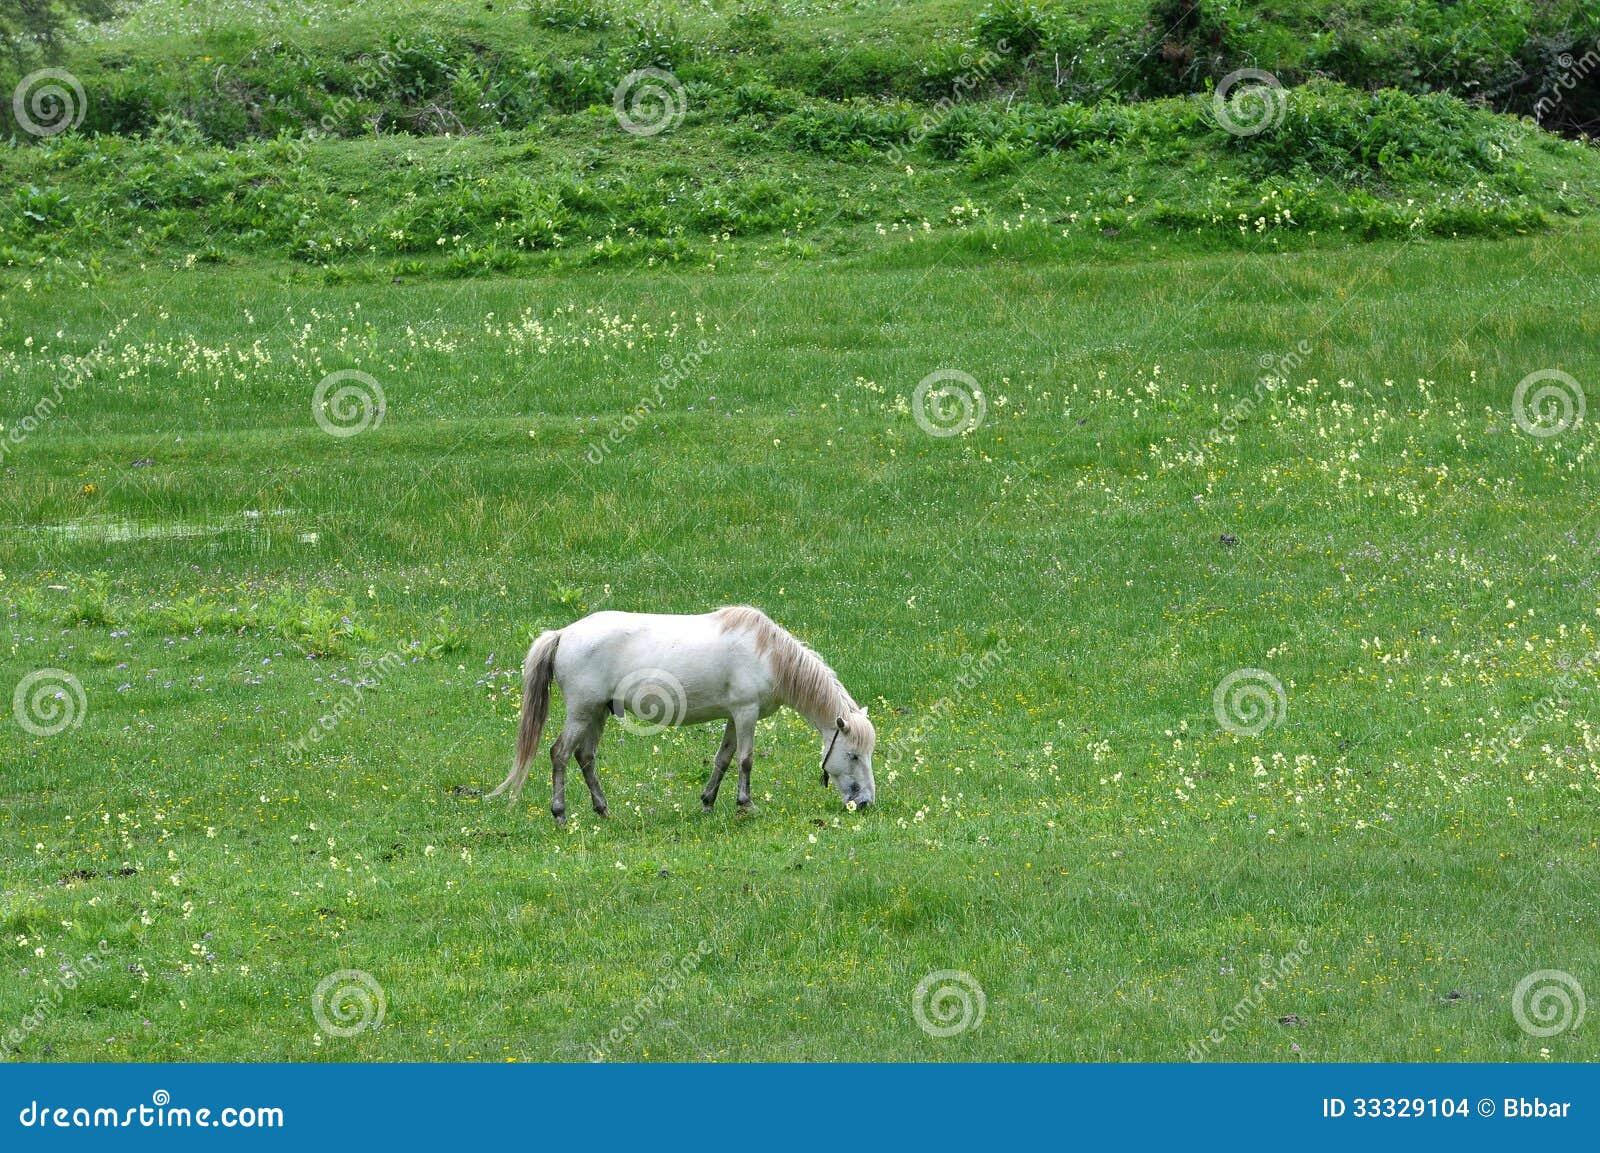 White horse eating grass - photo#5